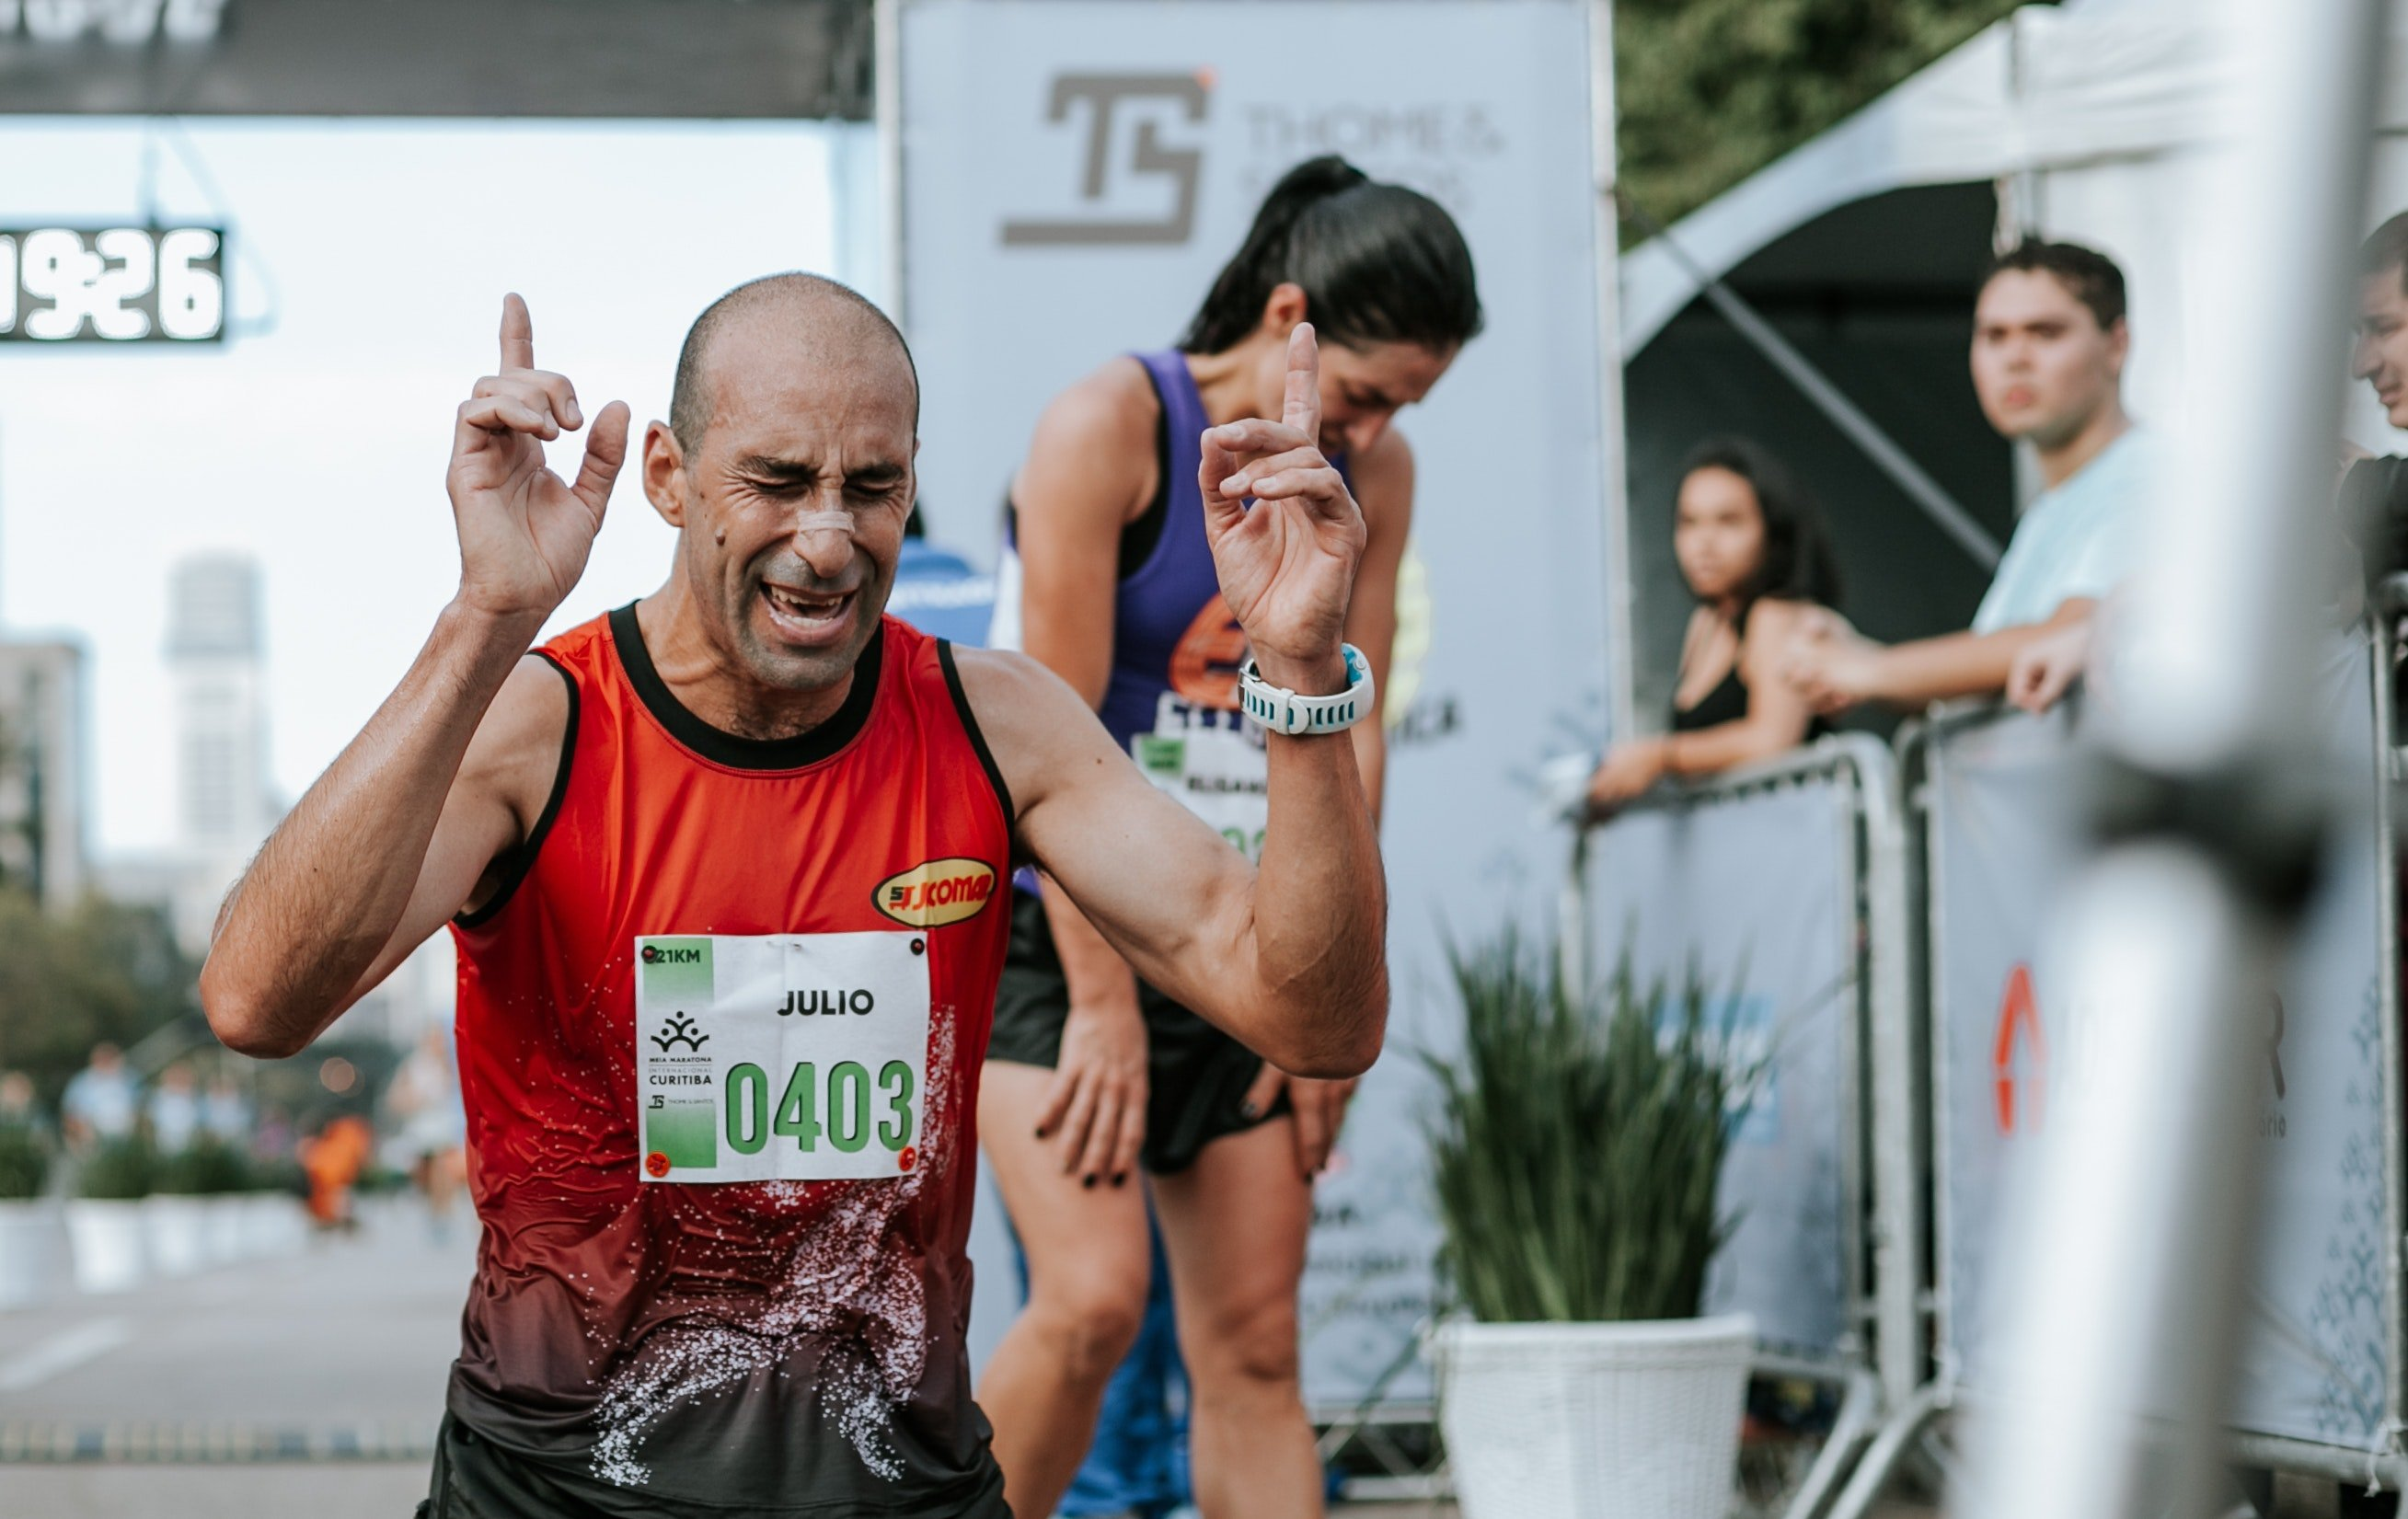 man on the finish line